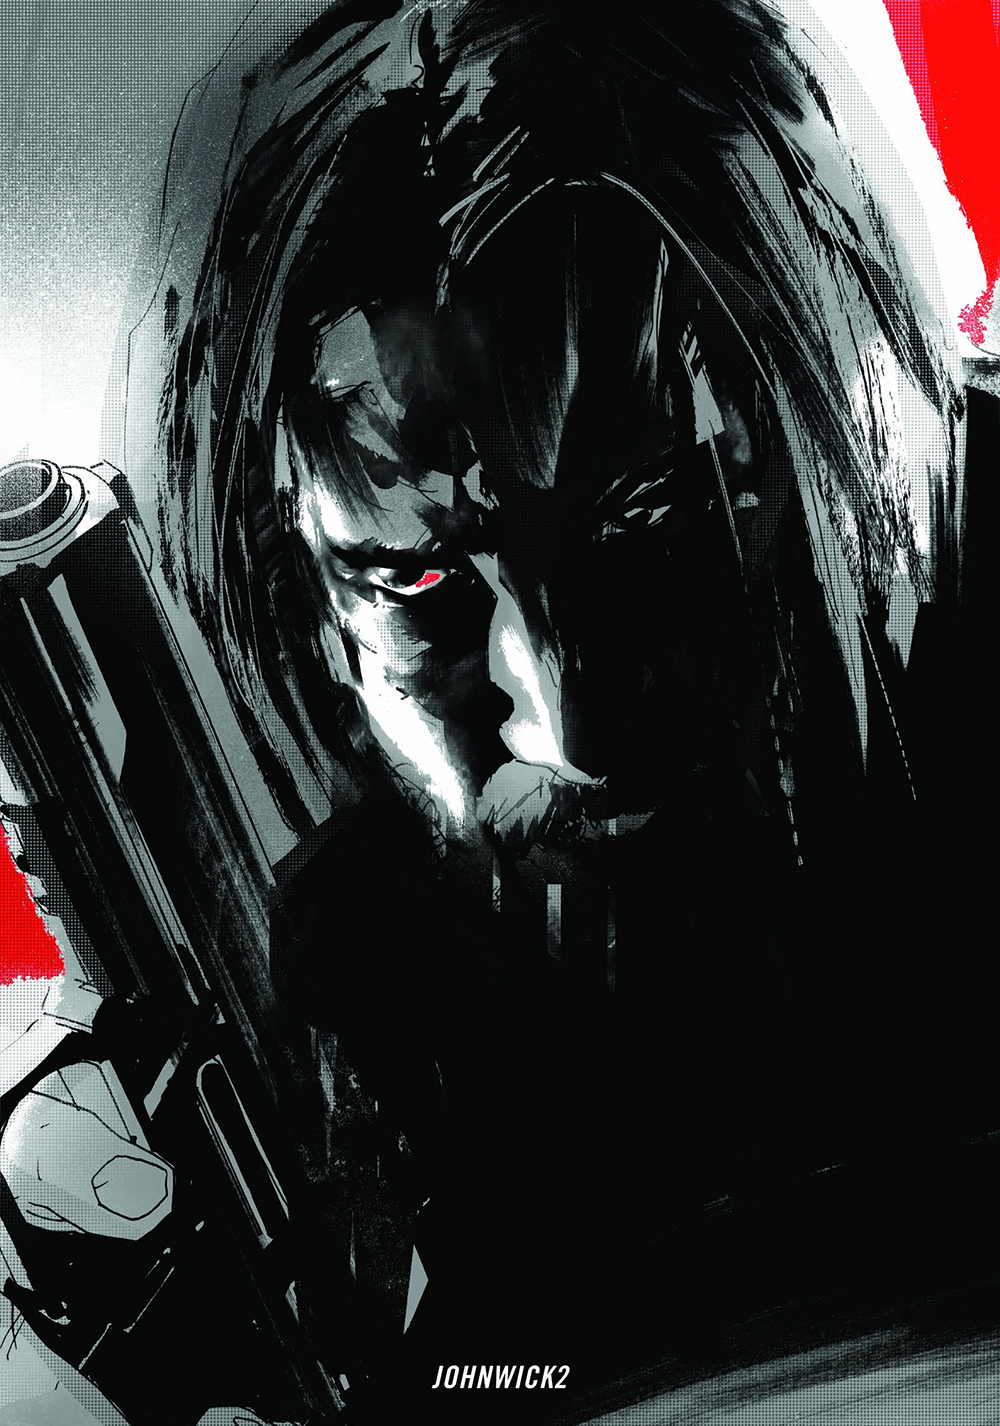 john wick 2 full movie free download in hindi